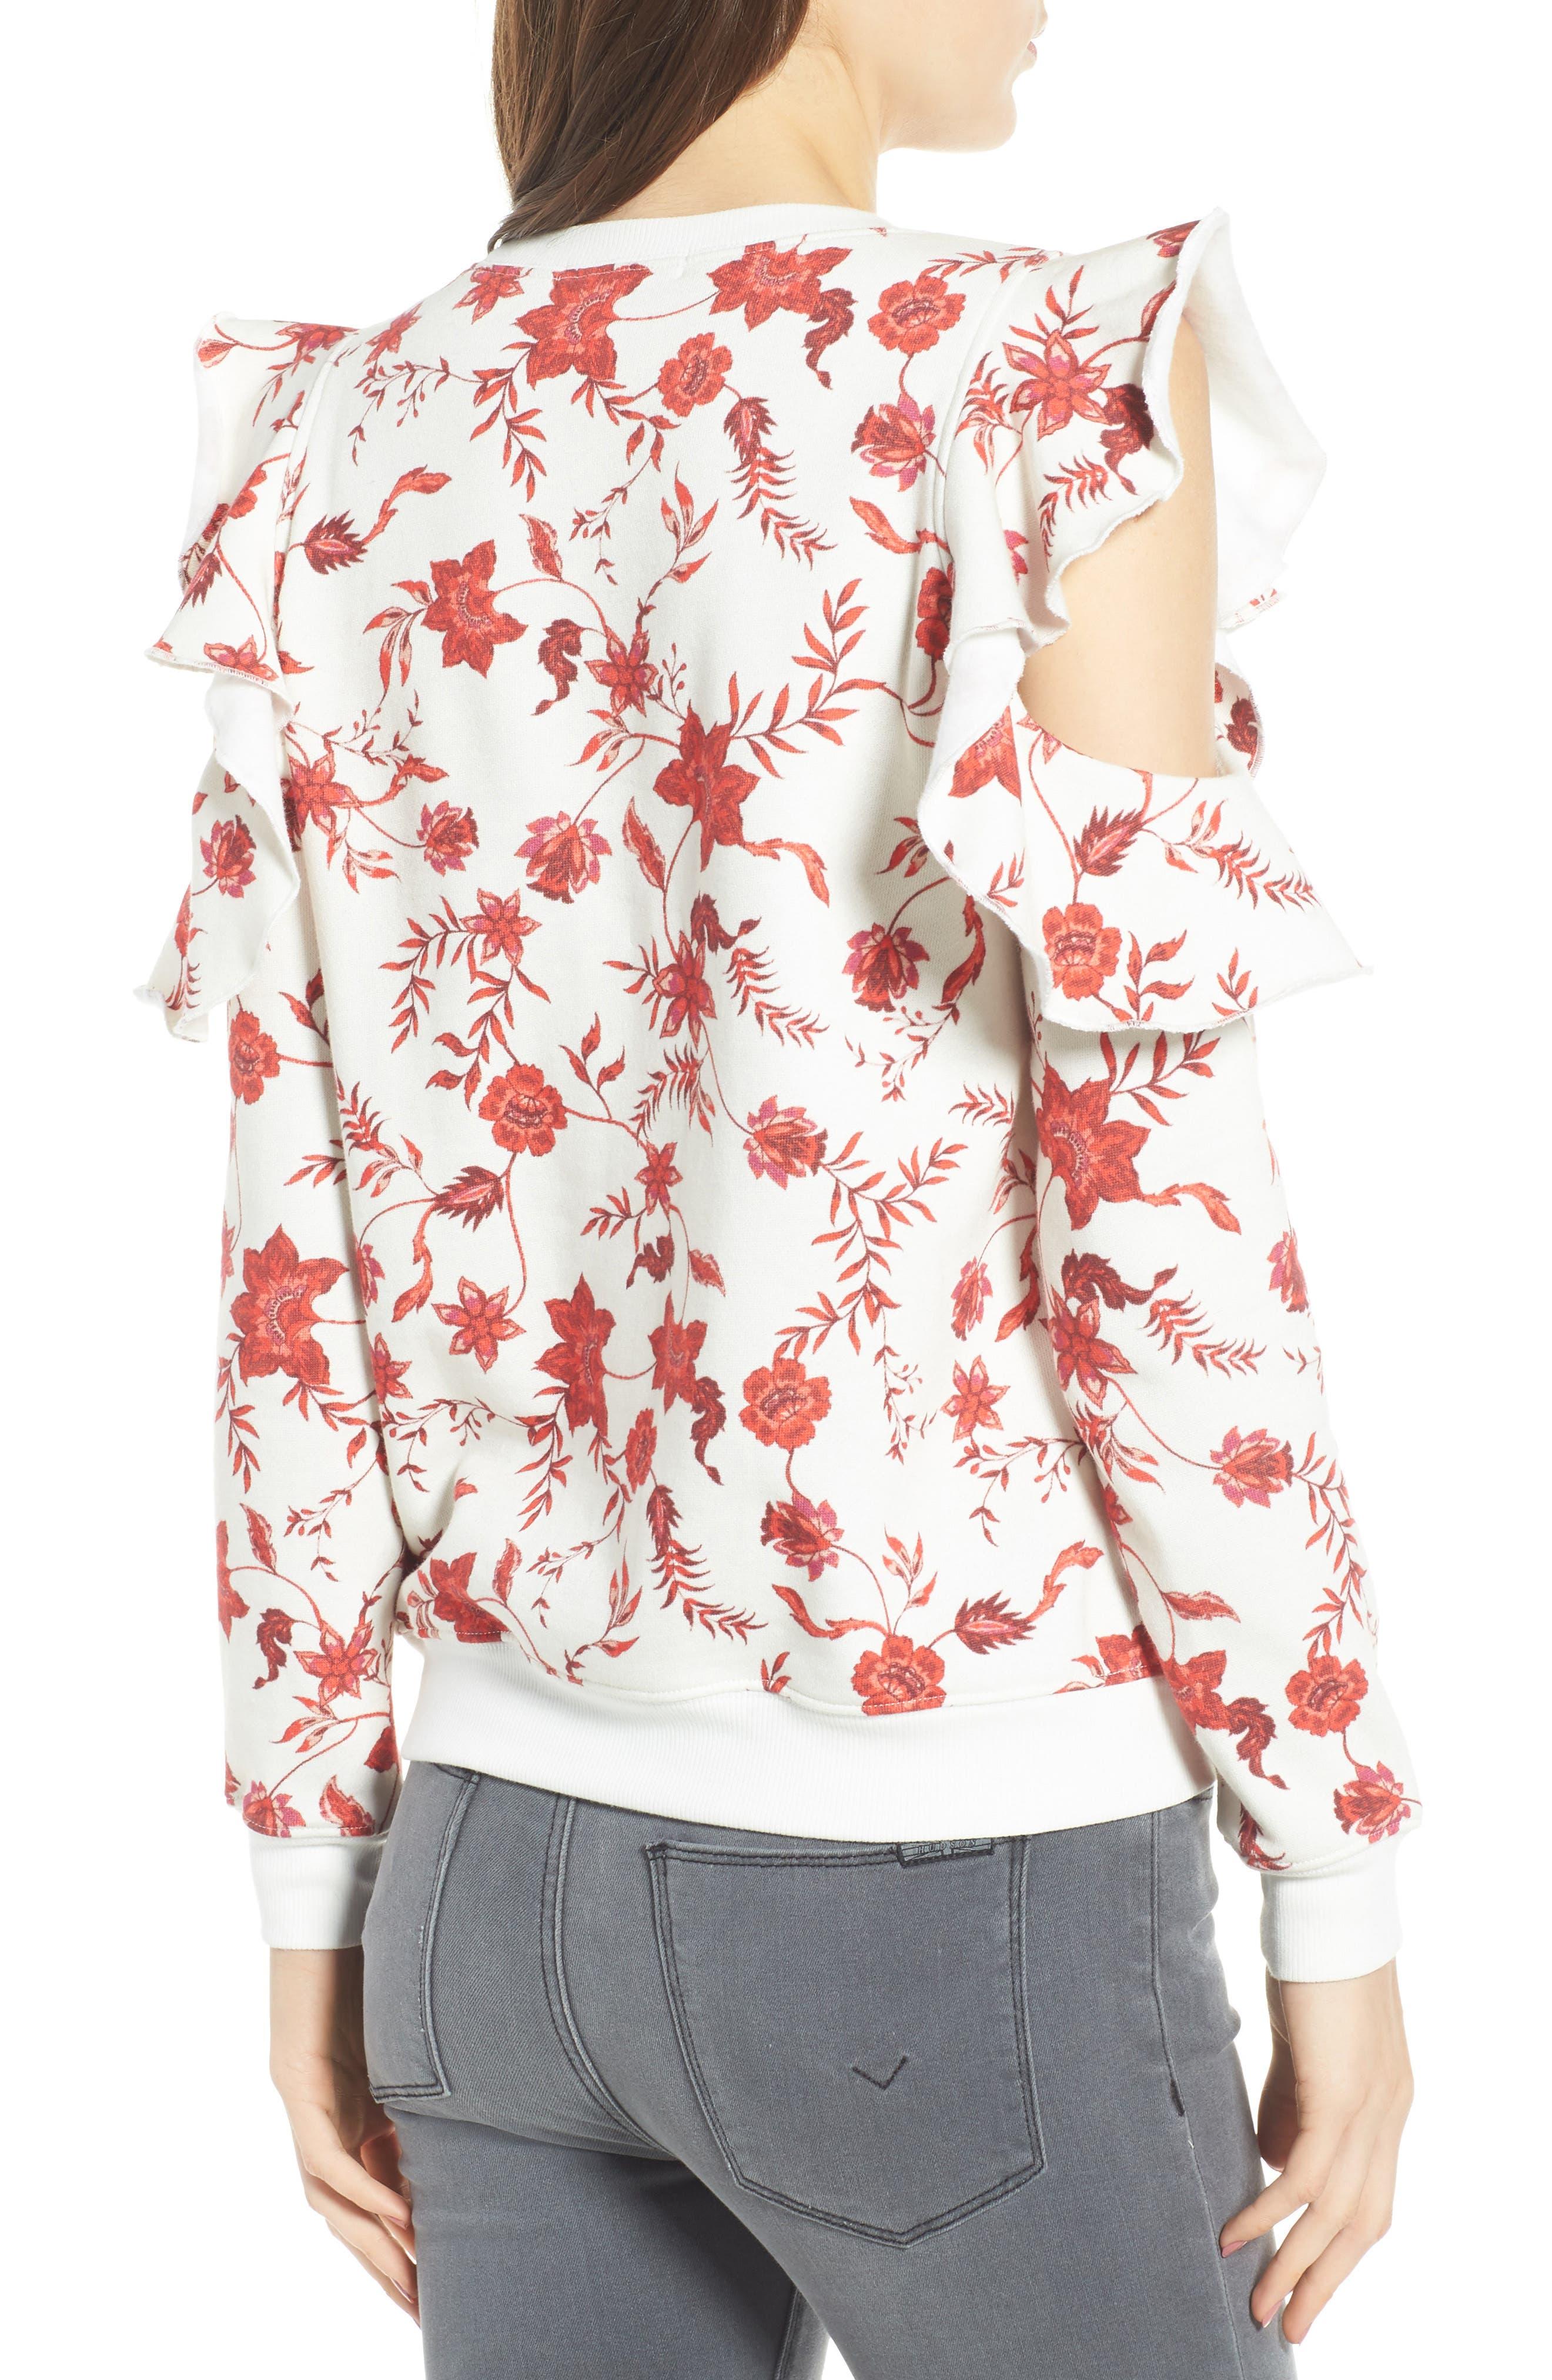 REBECCA MINKOFF,                             Gracie Cold Shoulder Floral Sweatshirt,                             Alternate thumbnail 2, color,                             900